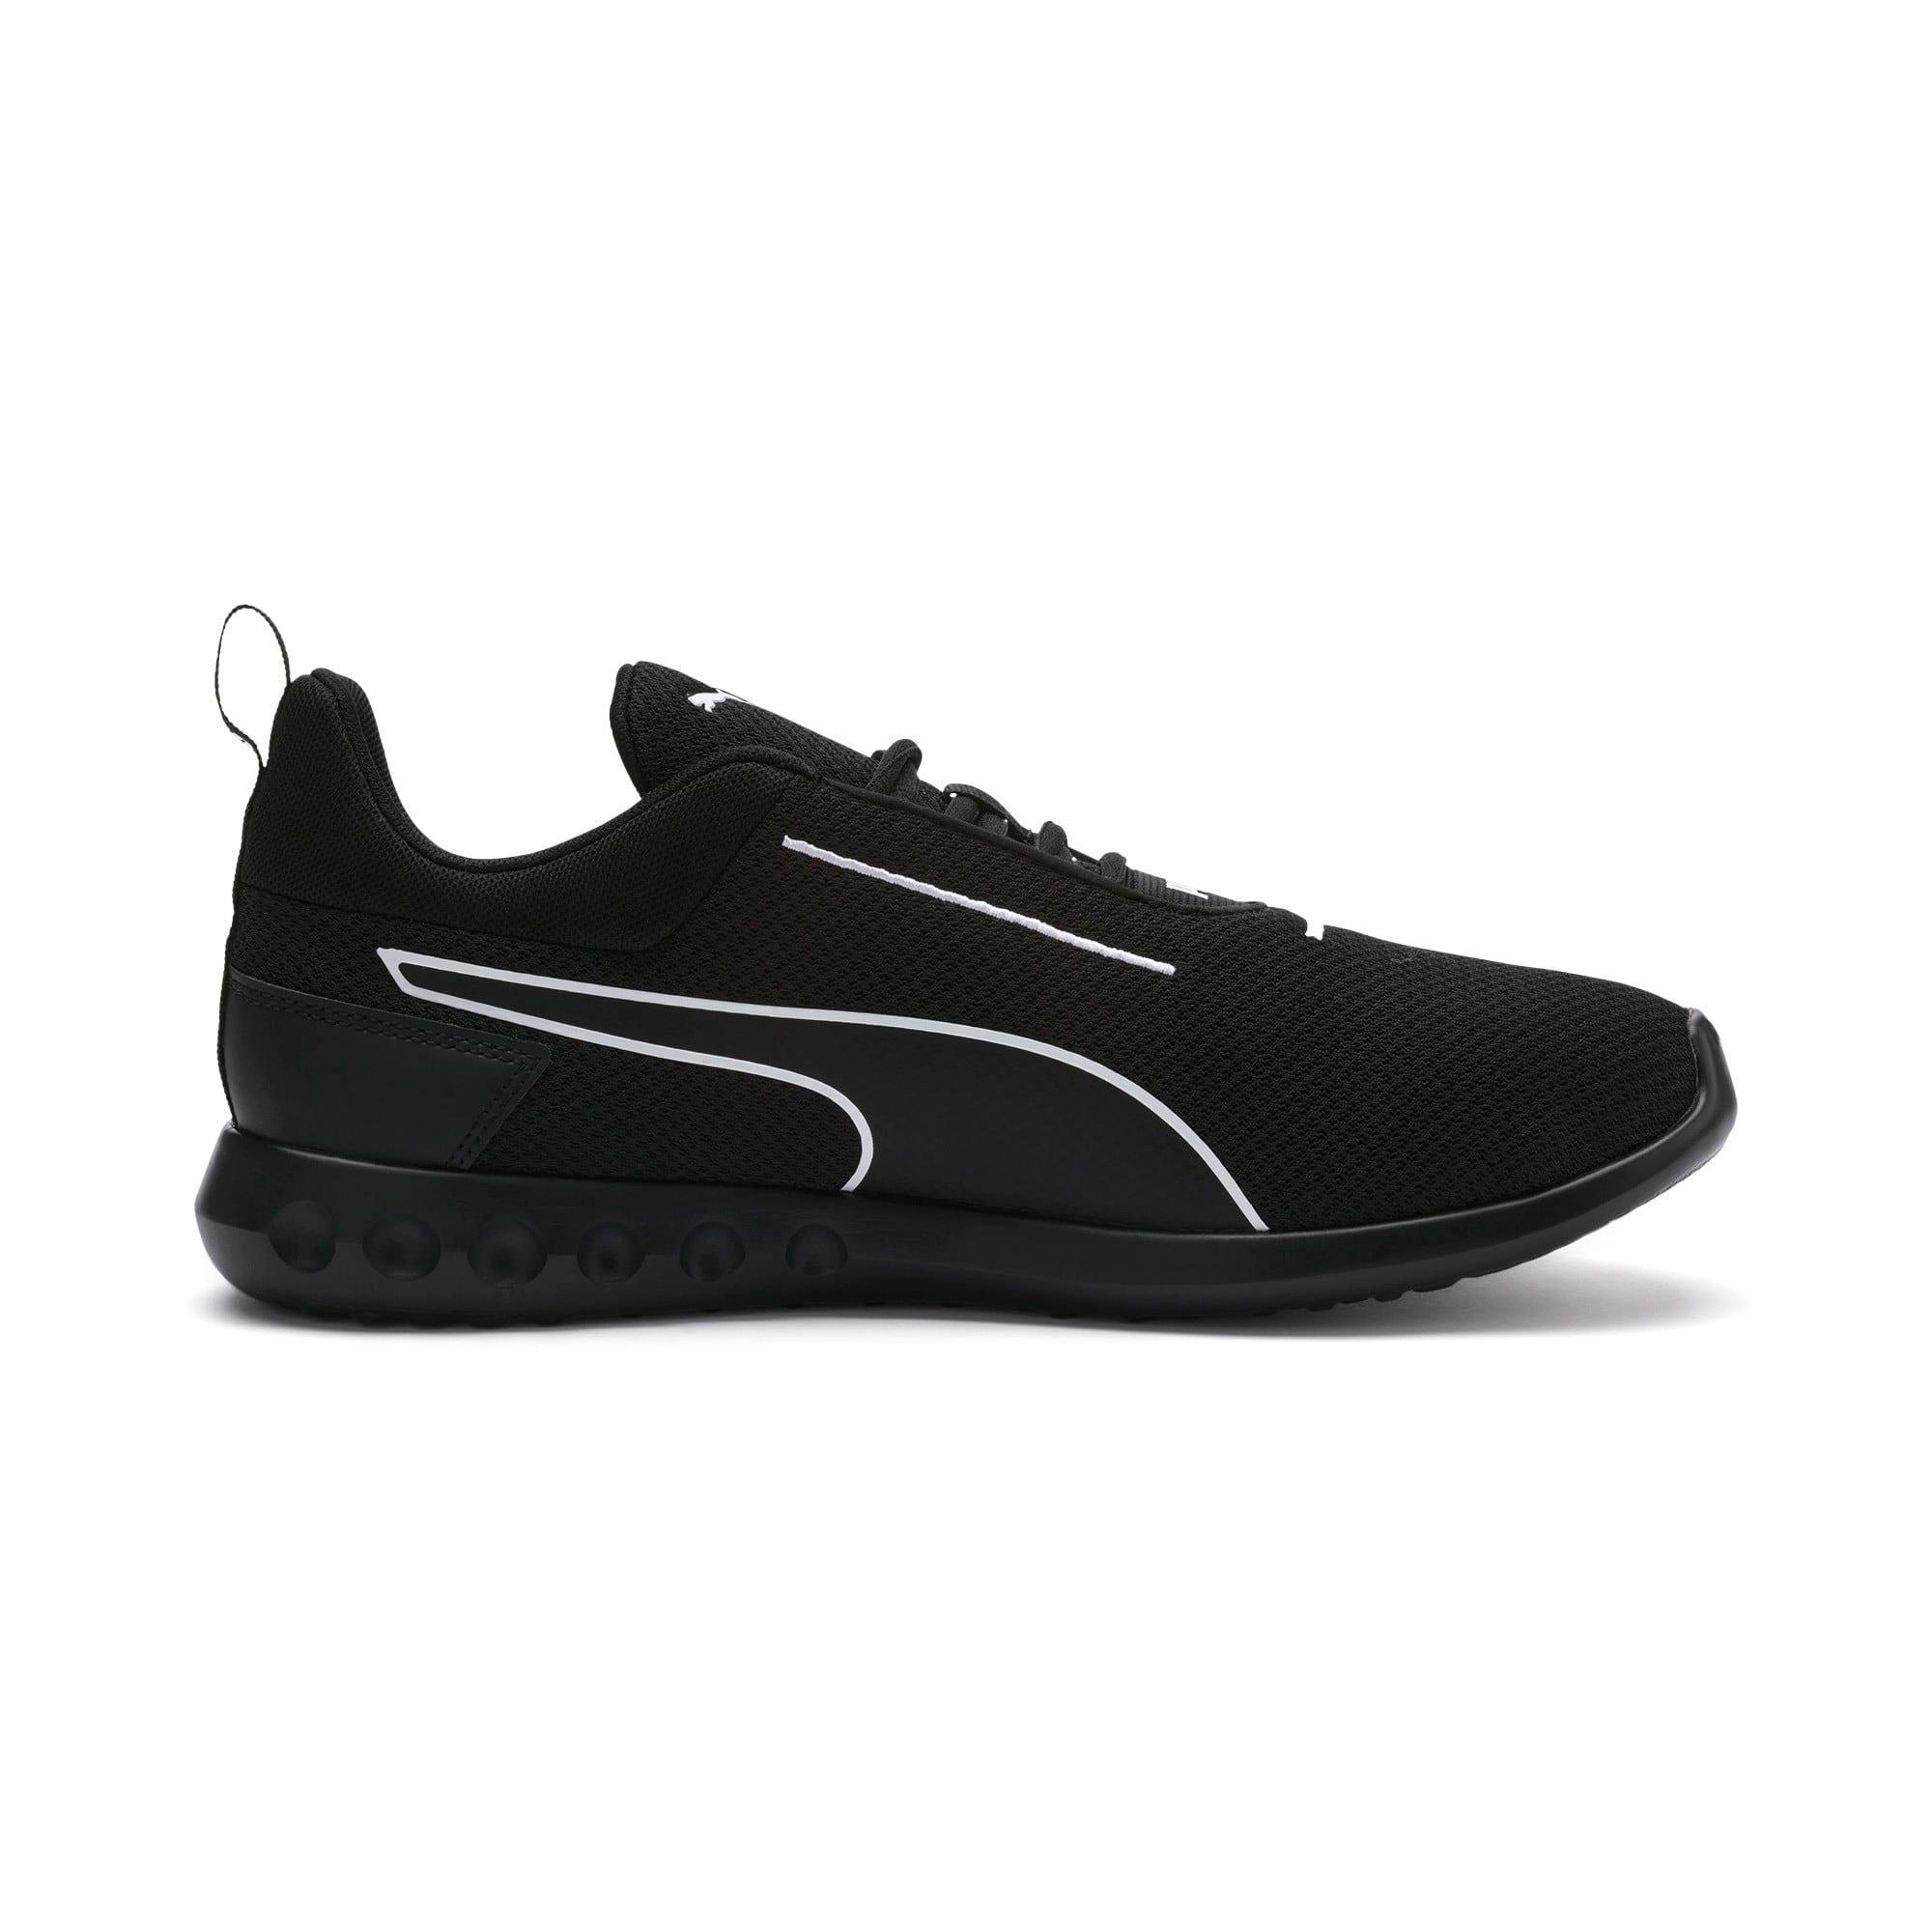 Thumbnail 5 of Carson 2 Concave Herren Sneaker, Puma Black-Puma White, medium